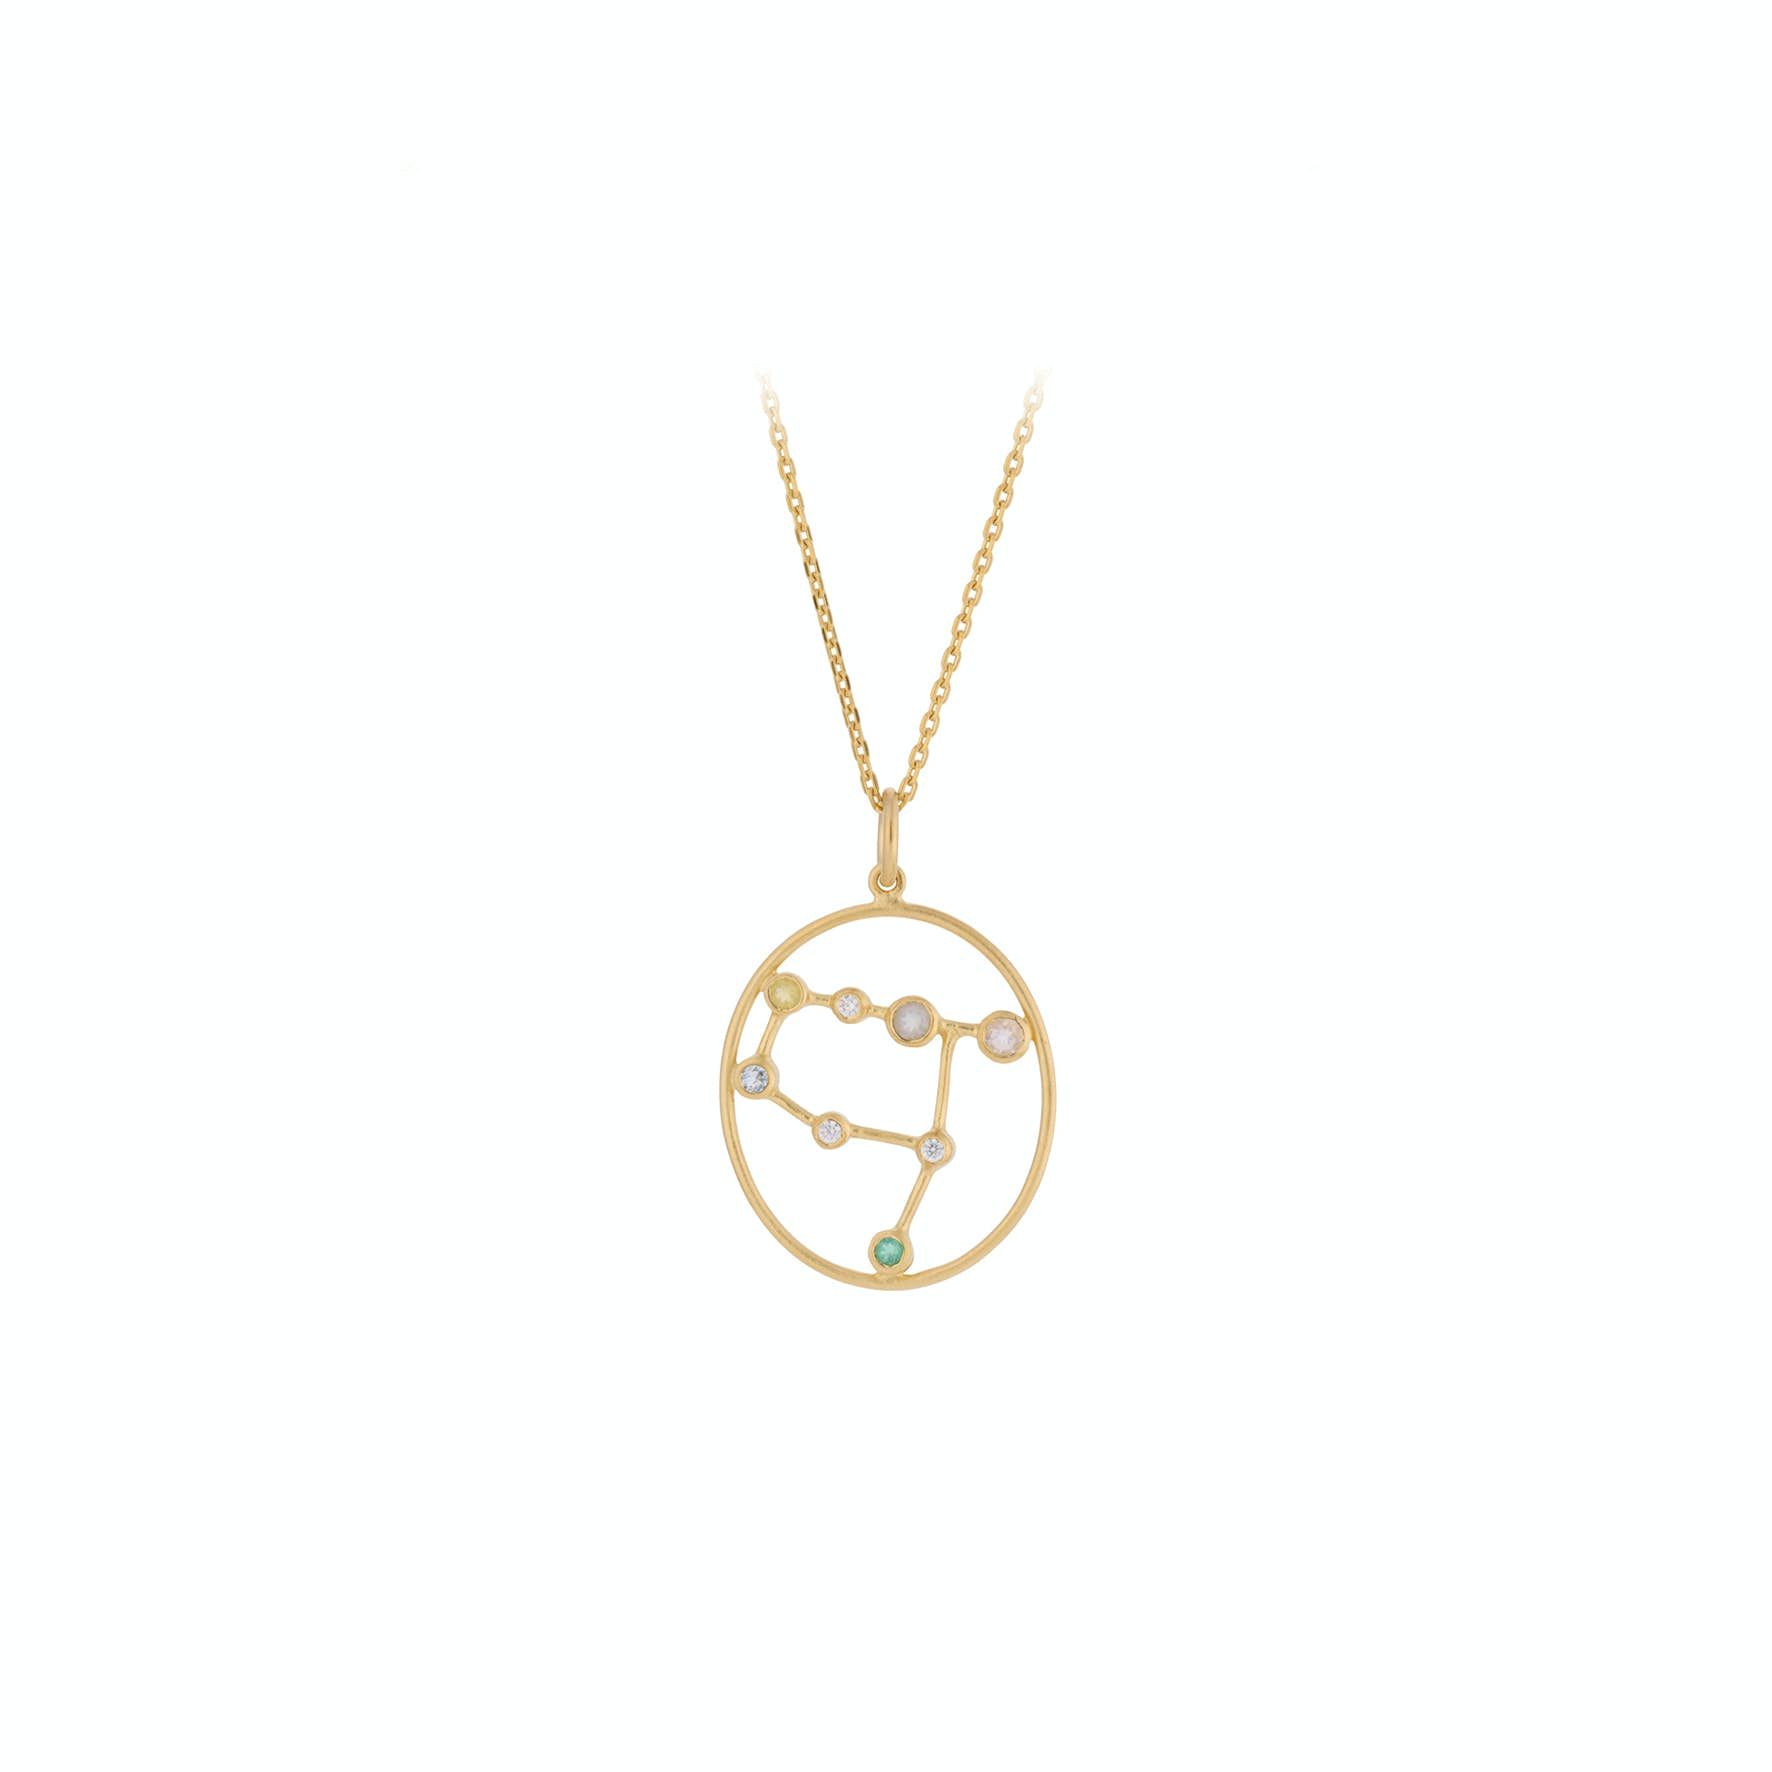 Zodiac Gemini Necklace (May 22 - June 21) von Pernille Corydon in Vergoldet-Silber Sterling 925